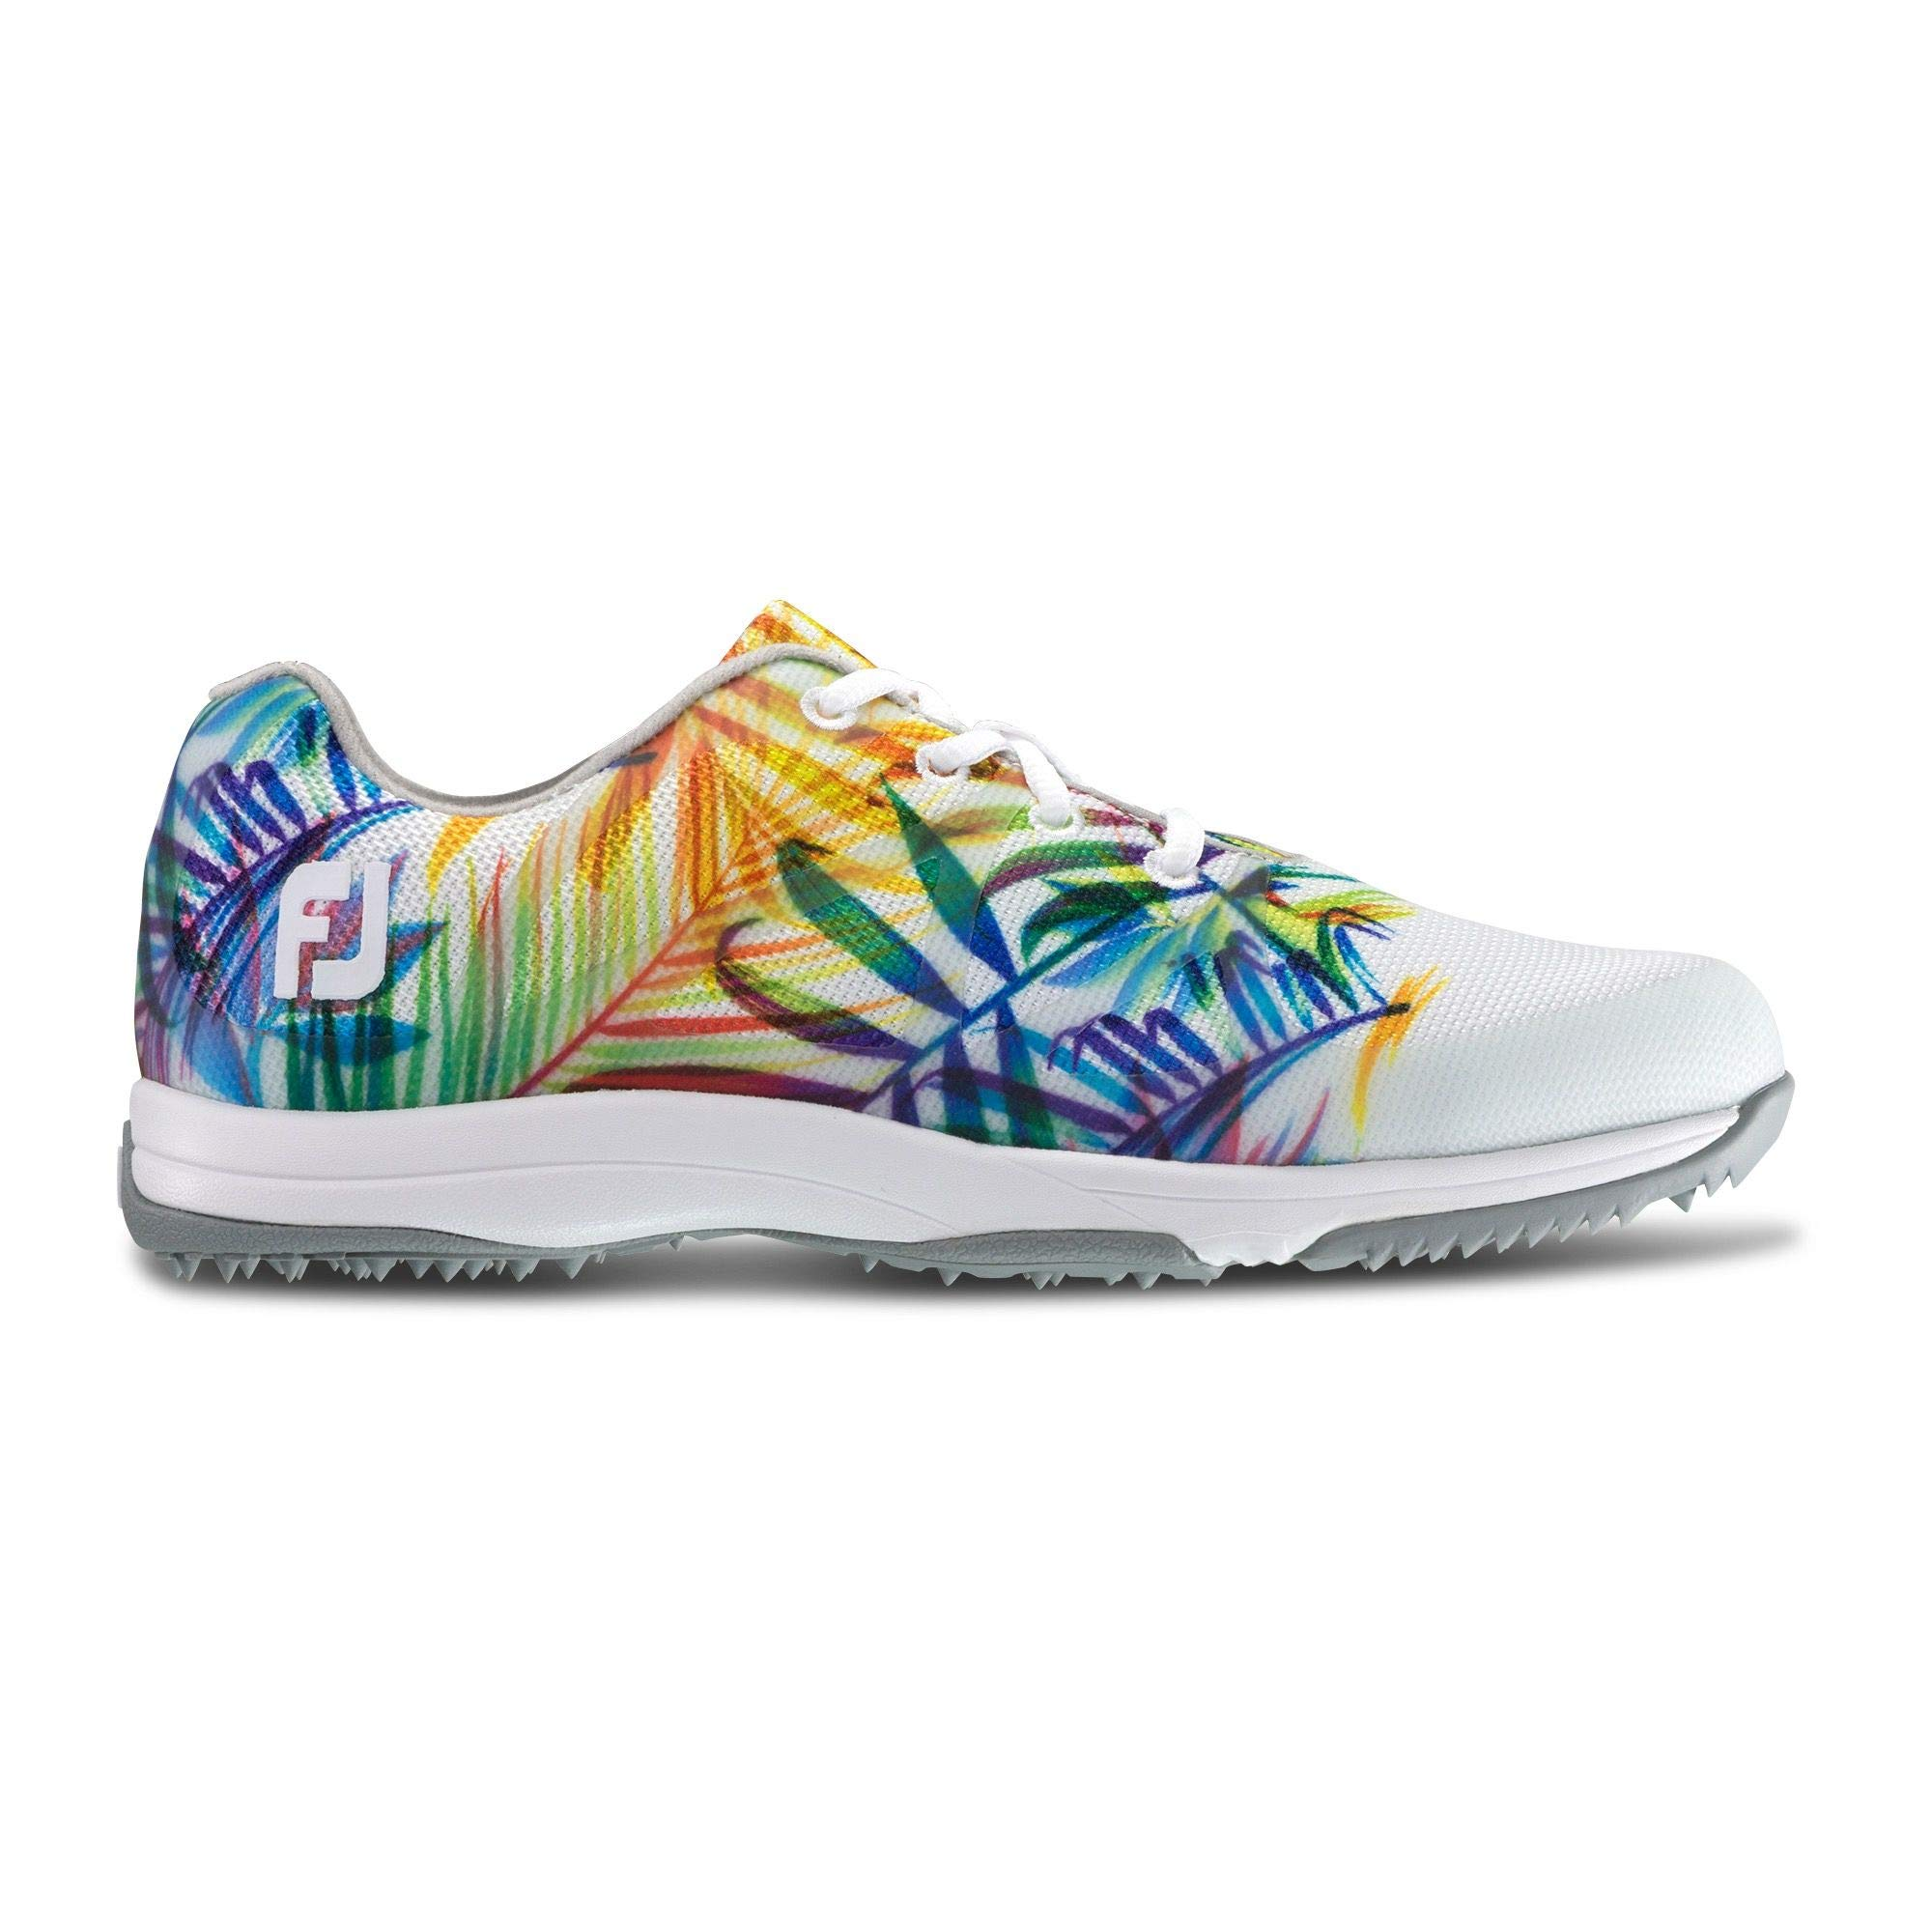 FootJoy Women's Leisure-Previous Season Style Golf Shoes White 5 M Tropical Print, US